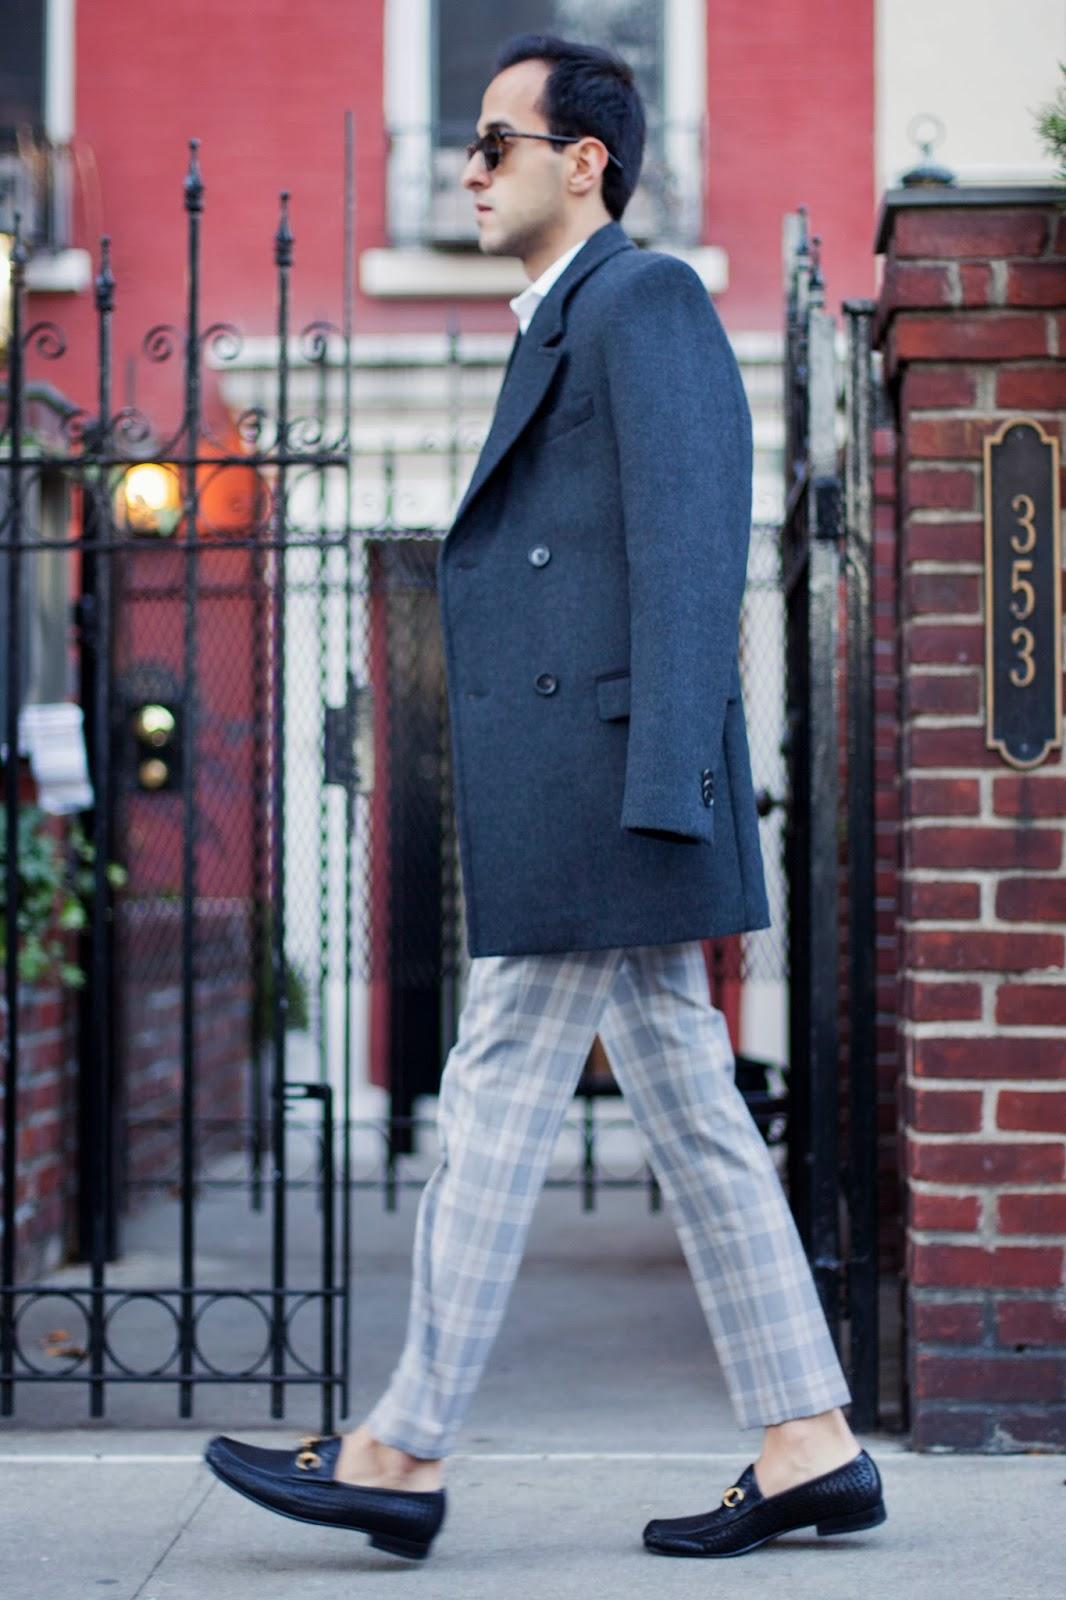 Born To Tailor IMG_2620-1MA copy.jpg